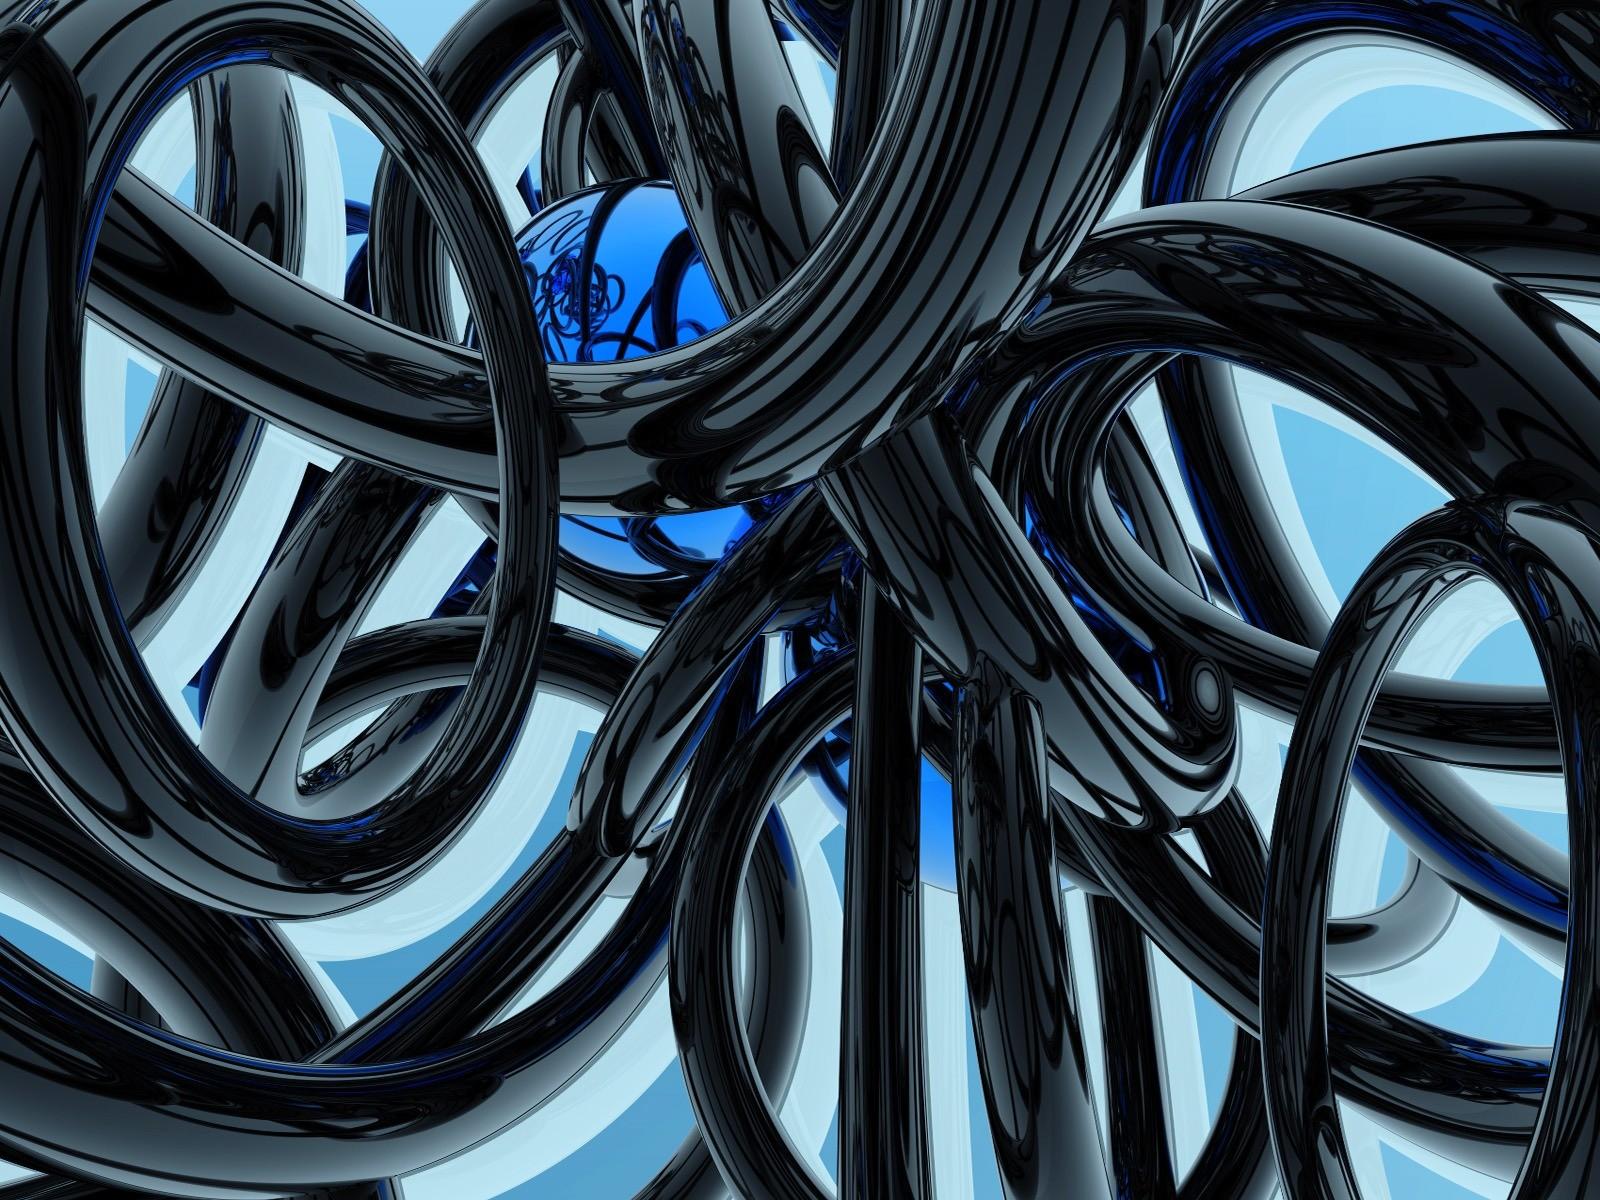 Wallpaper Hitam Satu Warna 3D Kendaraan Biru